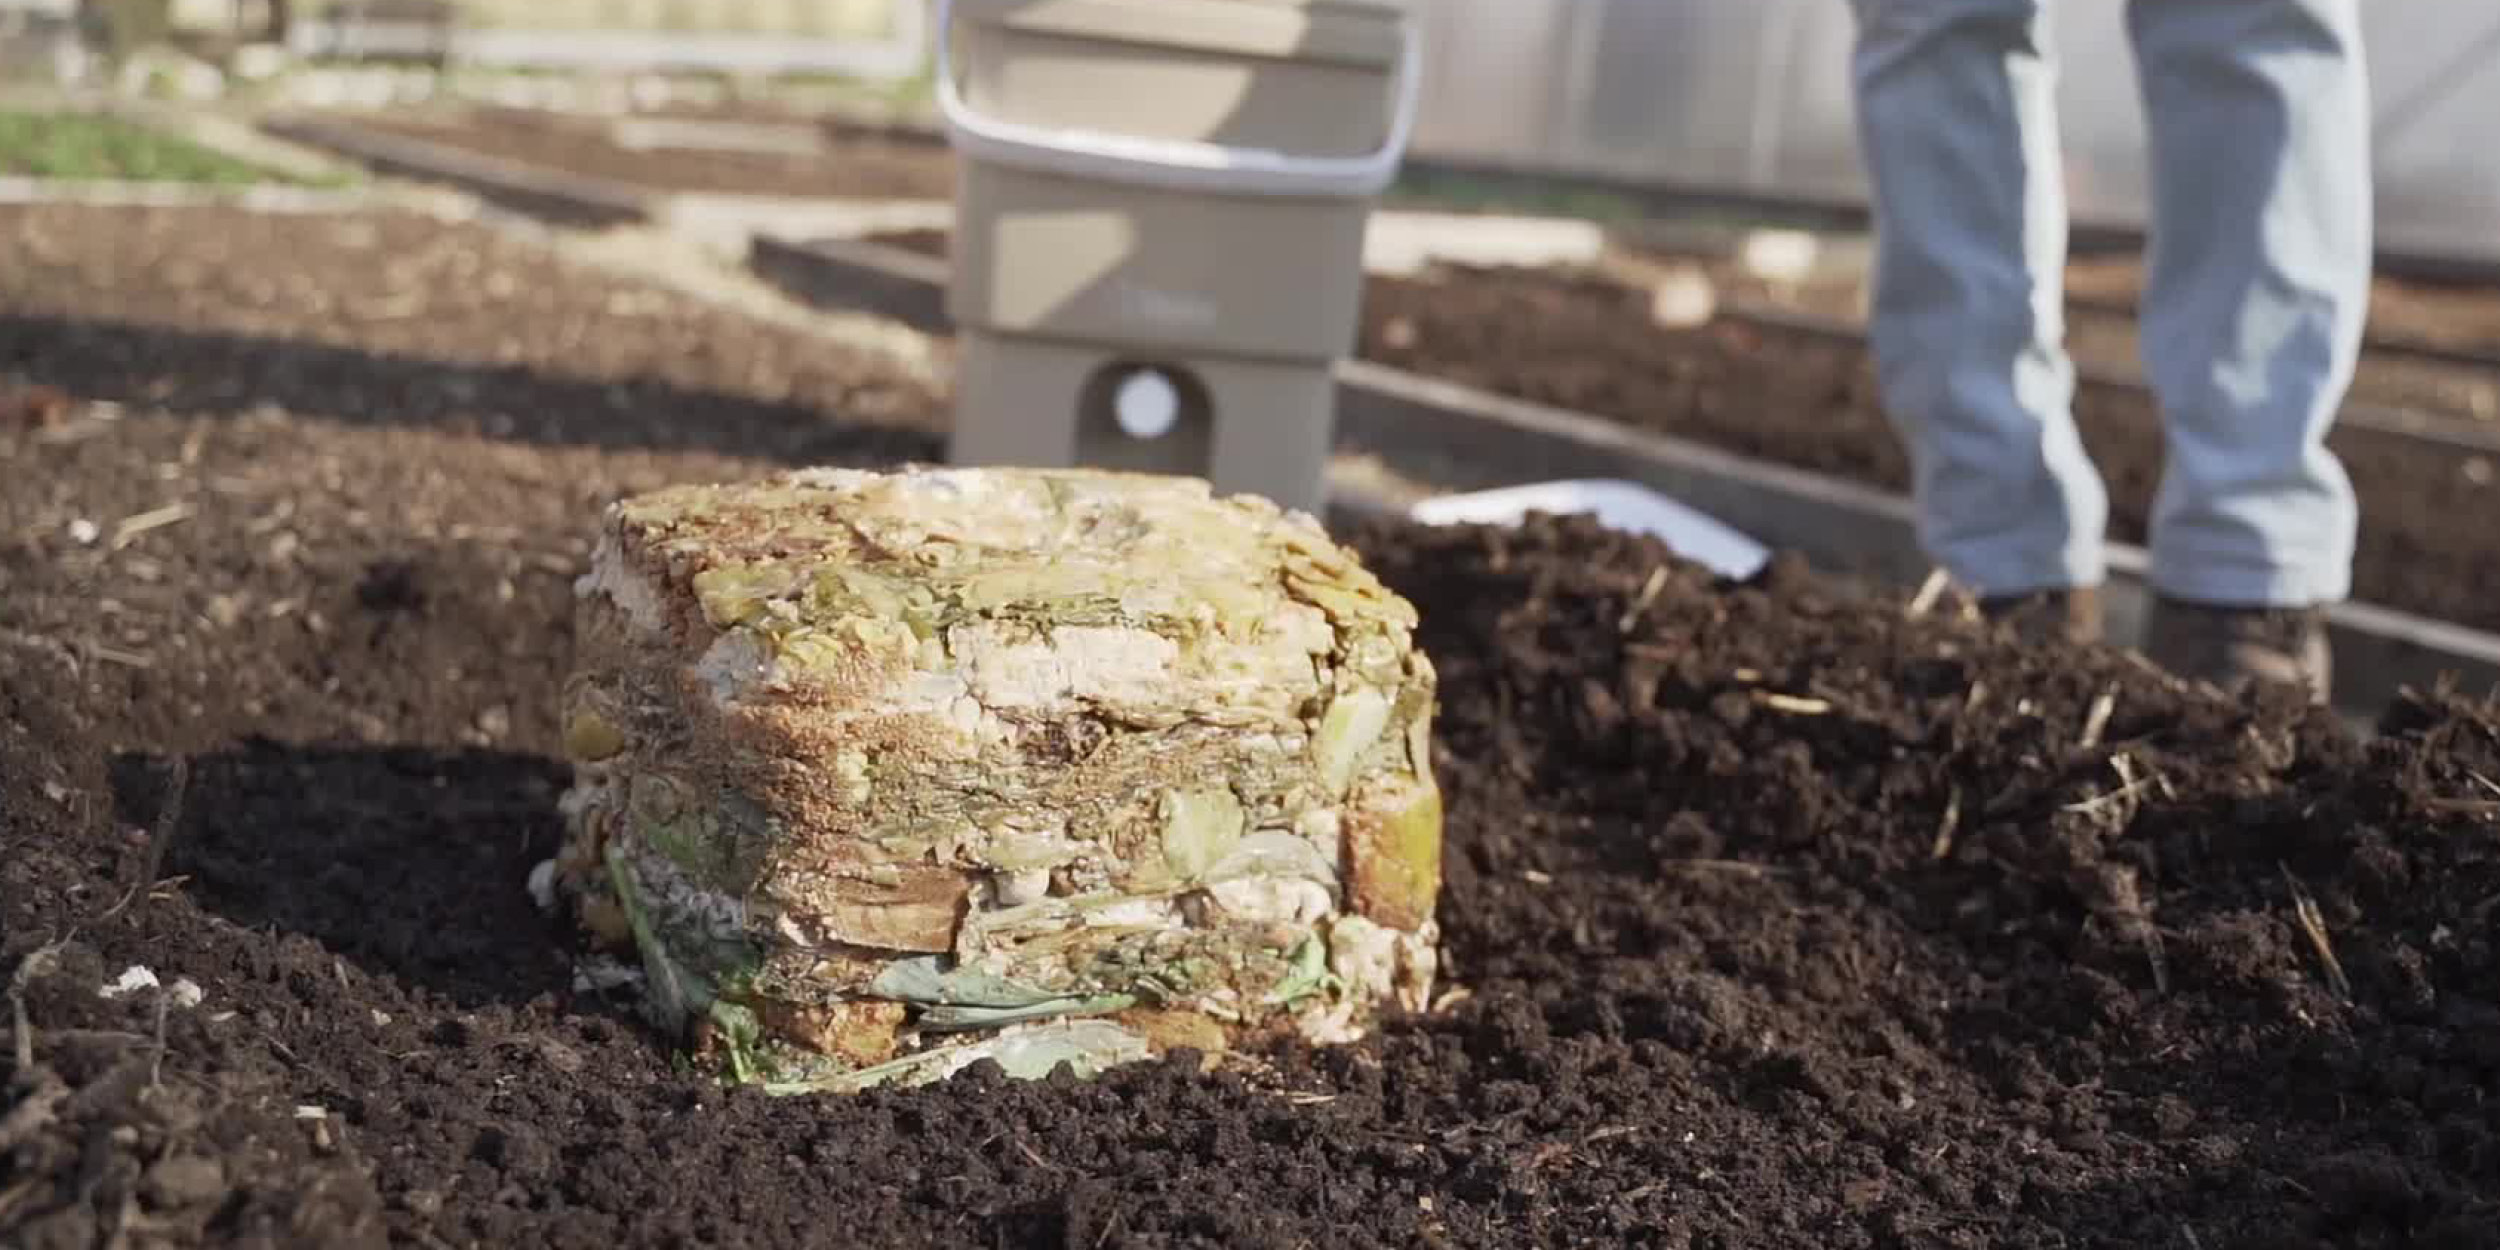 EM technology helps us grow healthier food